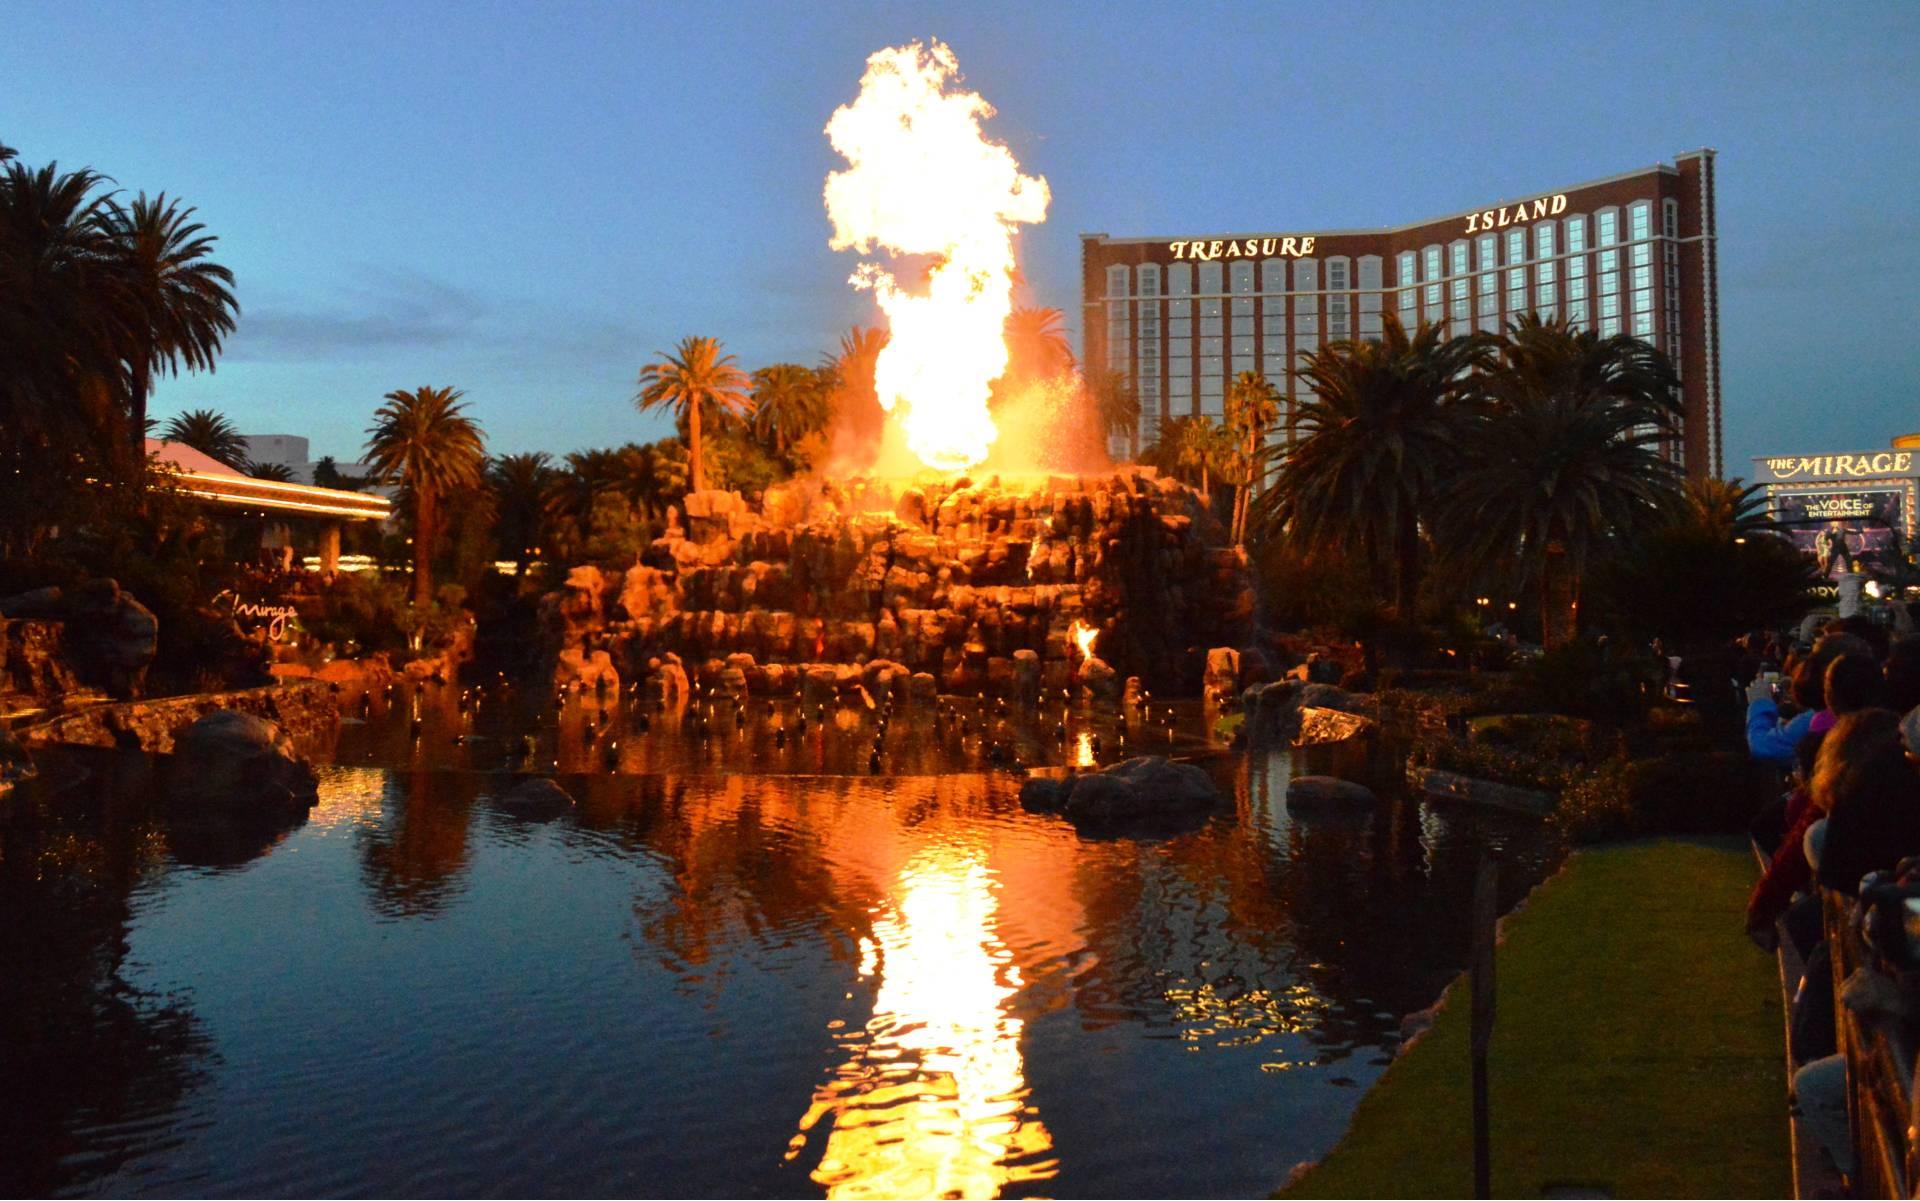 Volcano The Mirage Hotel